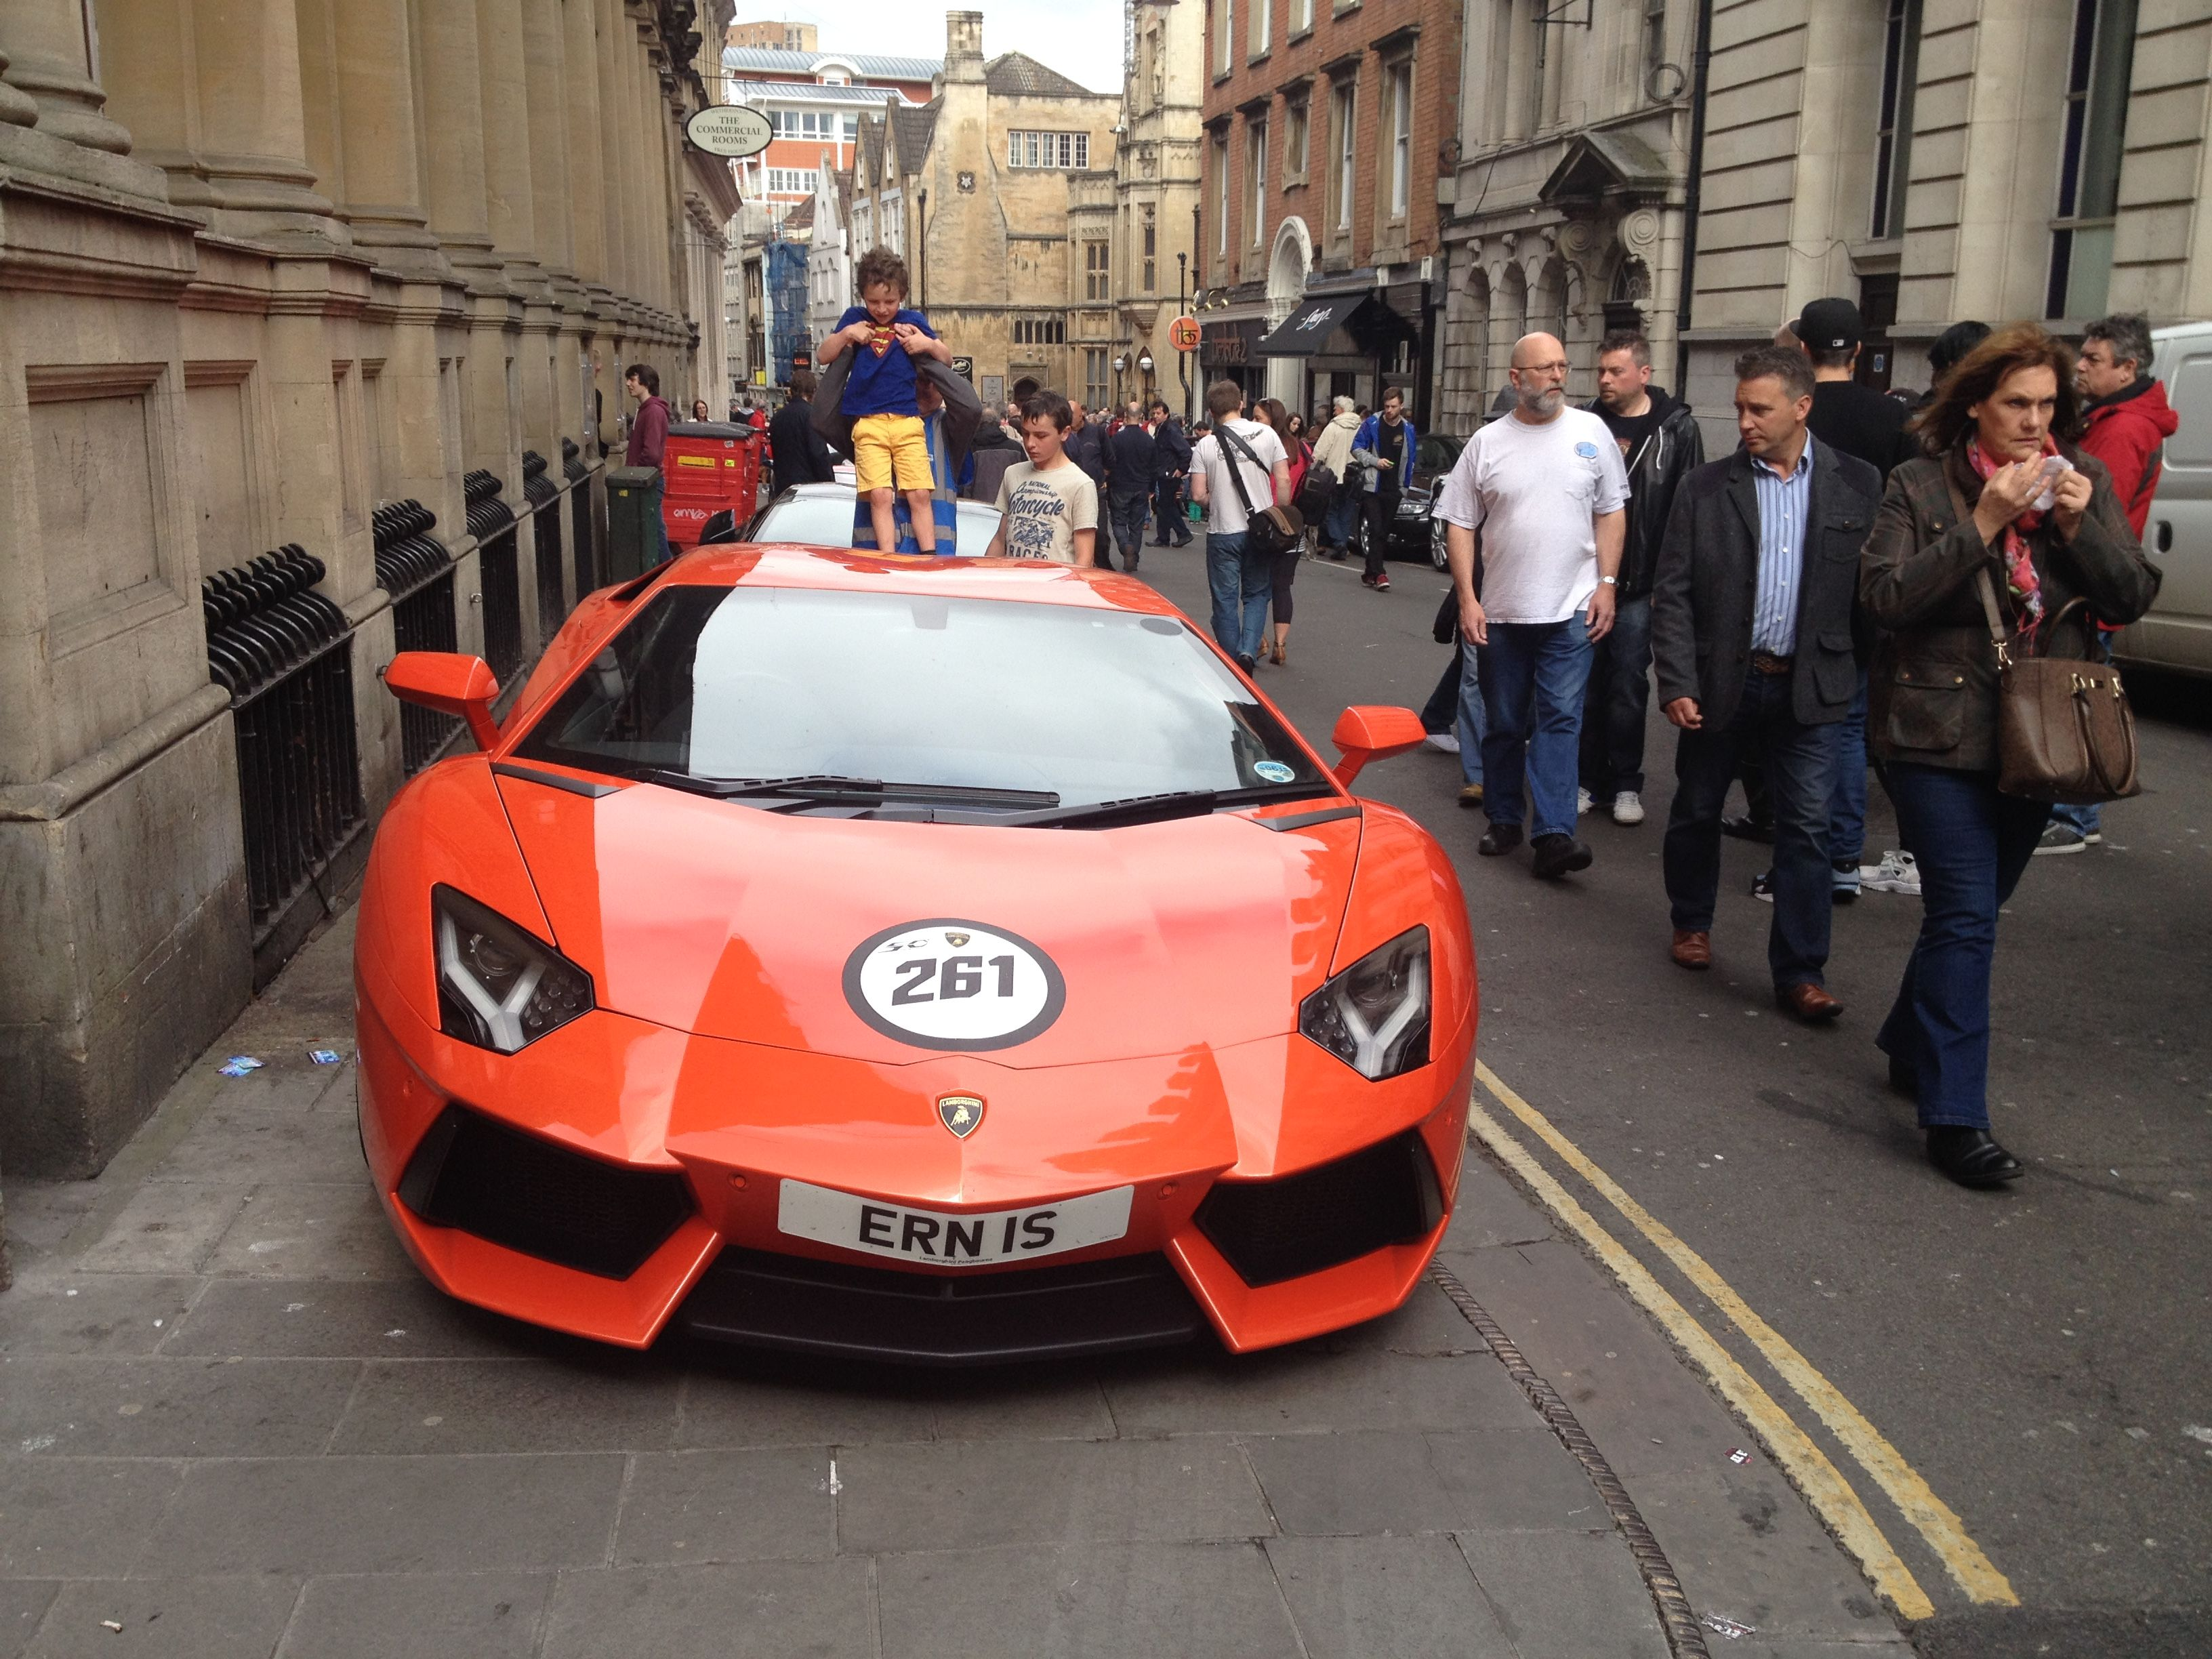 Aventador At The Italian Car Show On Corn Street In Bristol